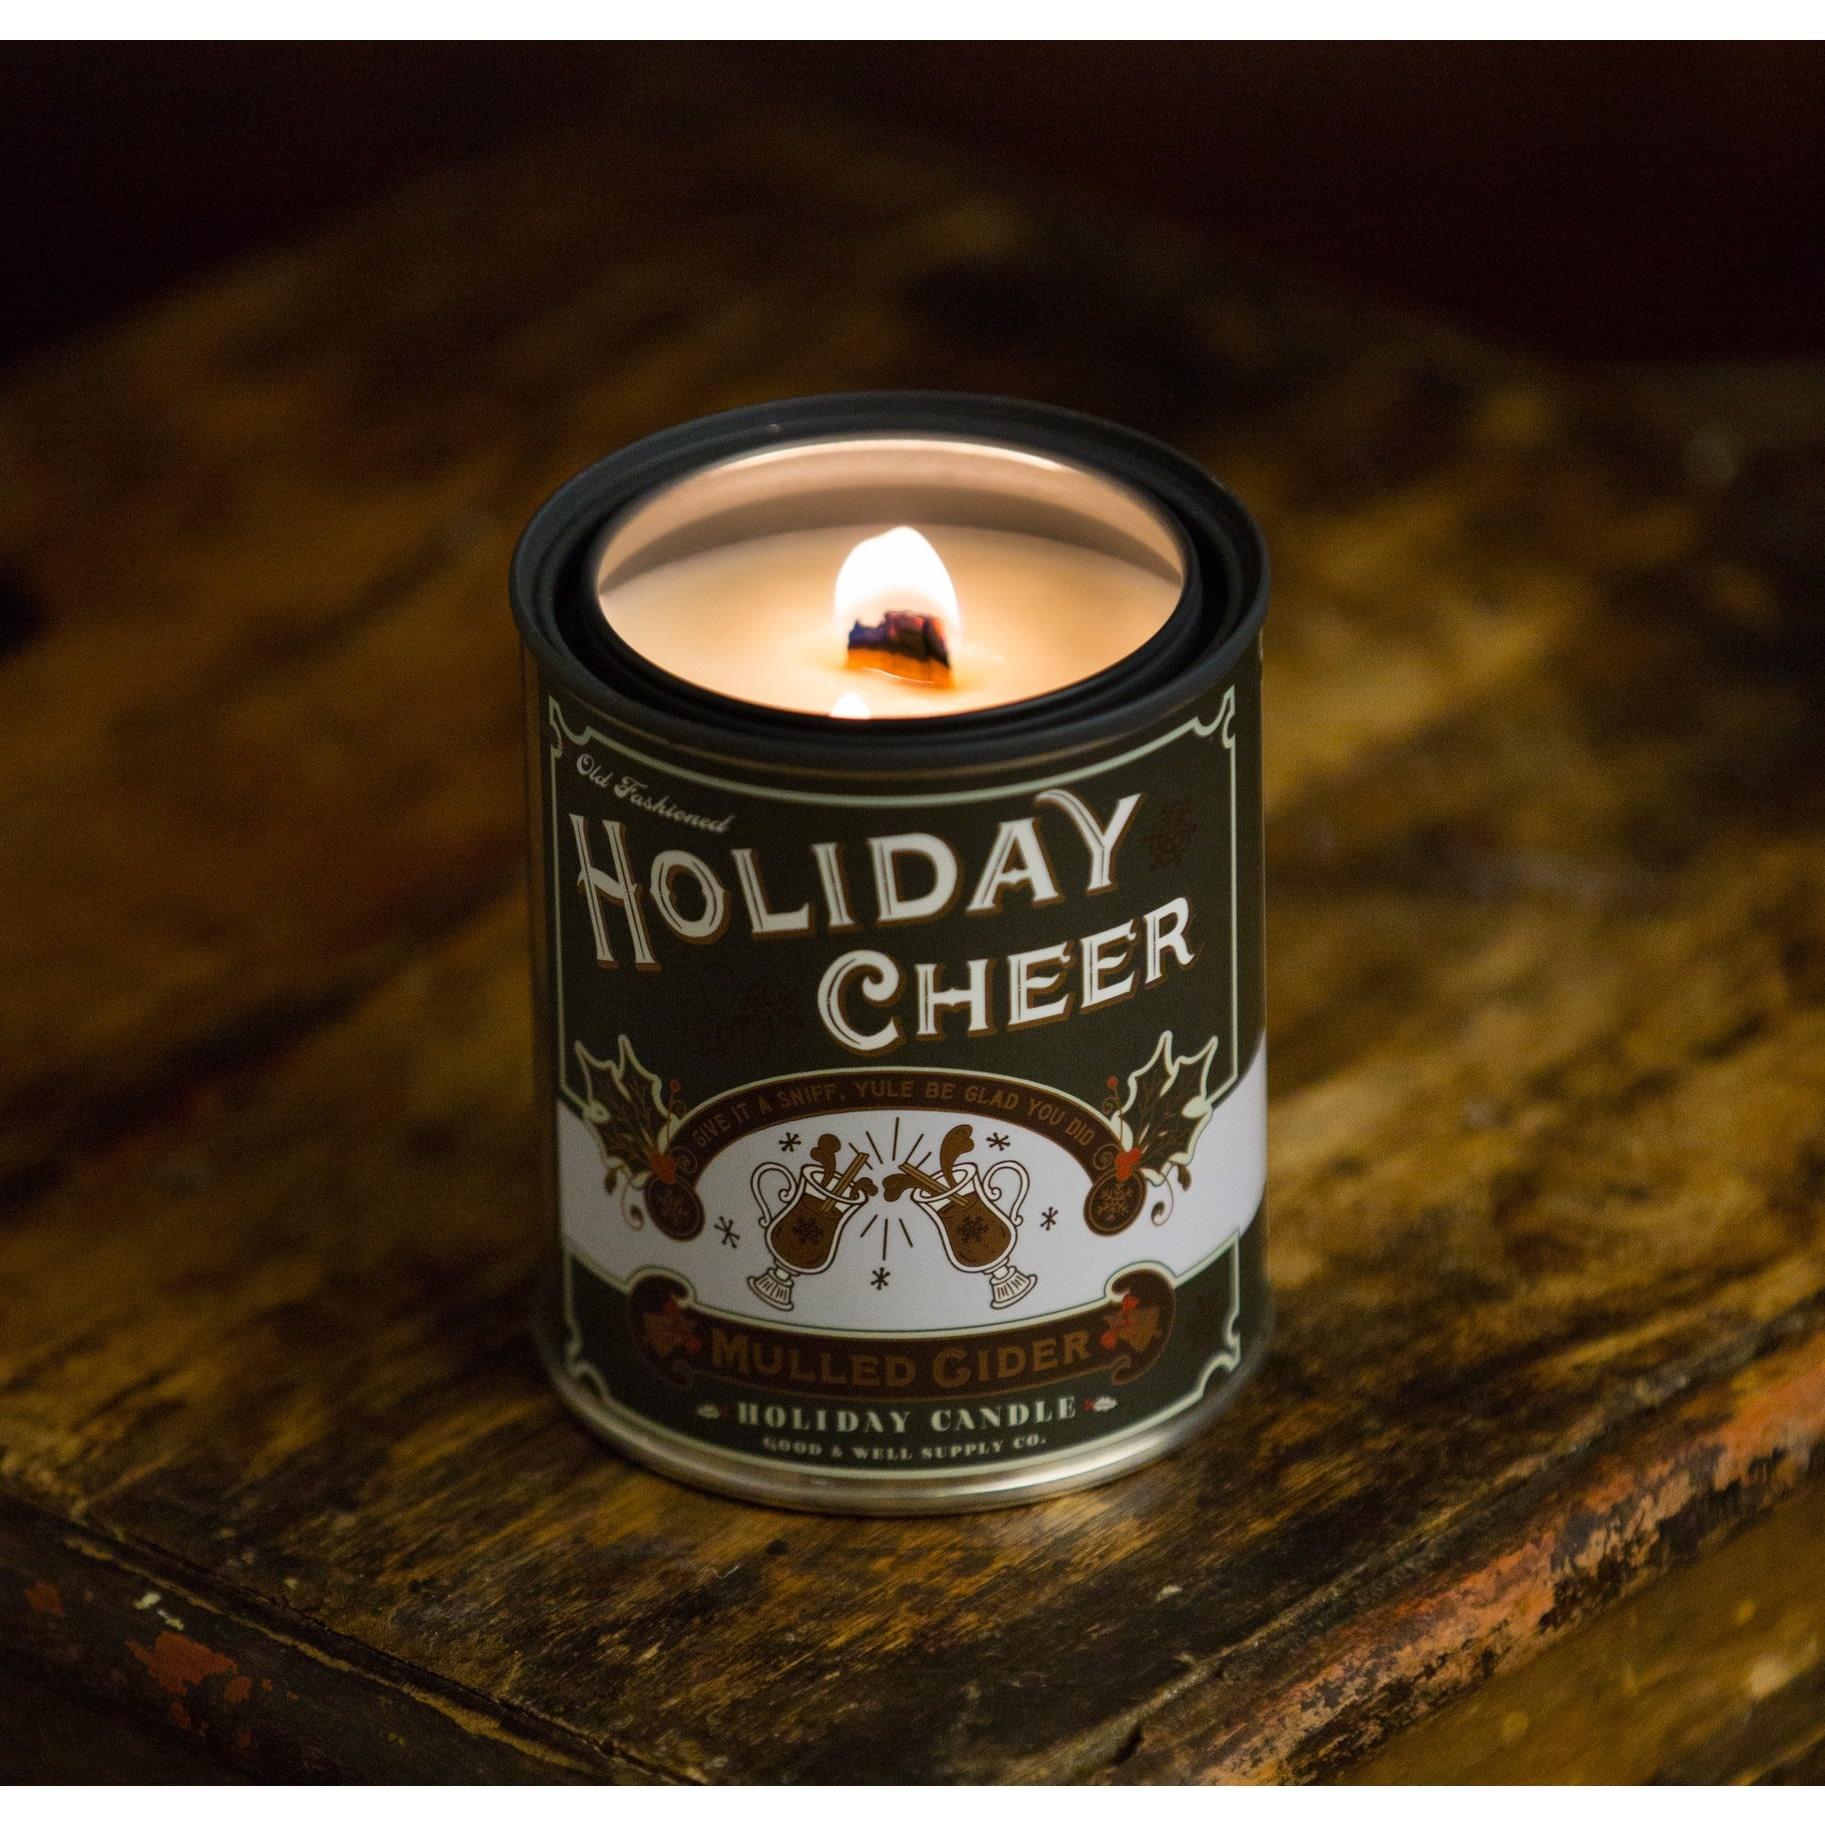 Holiday Cheer 1/2 Pint Candle